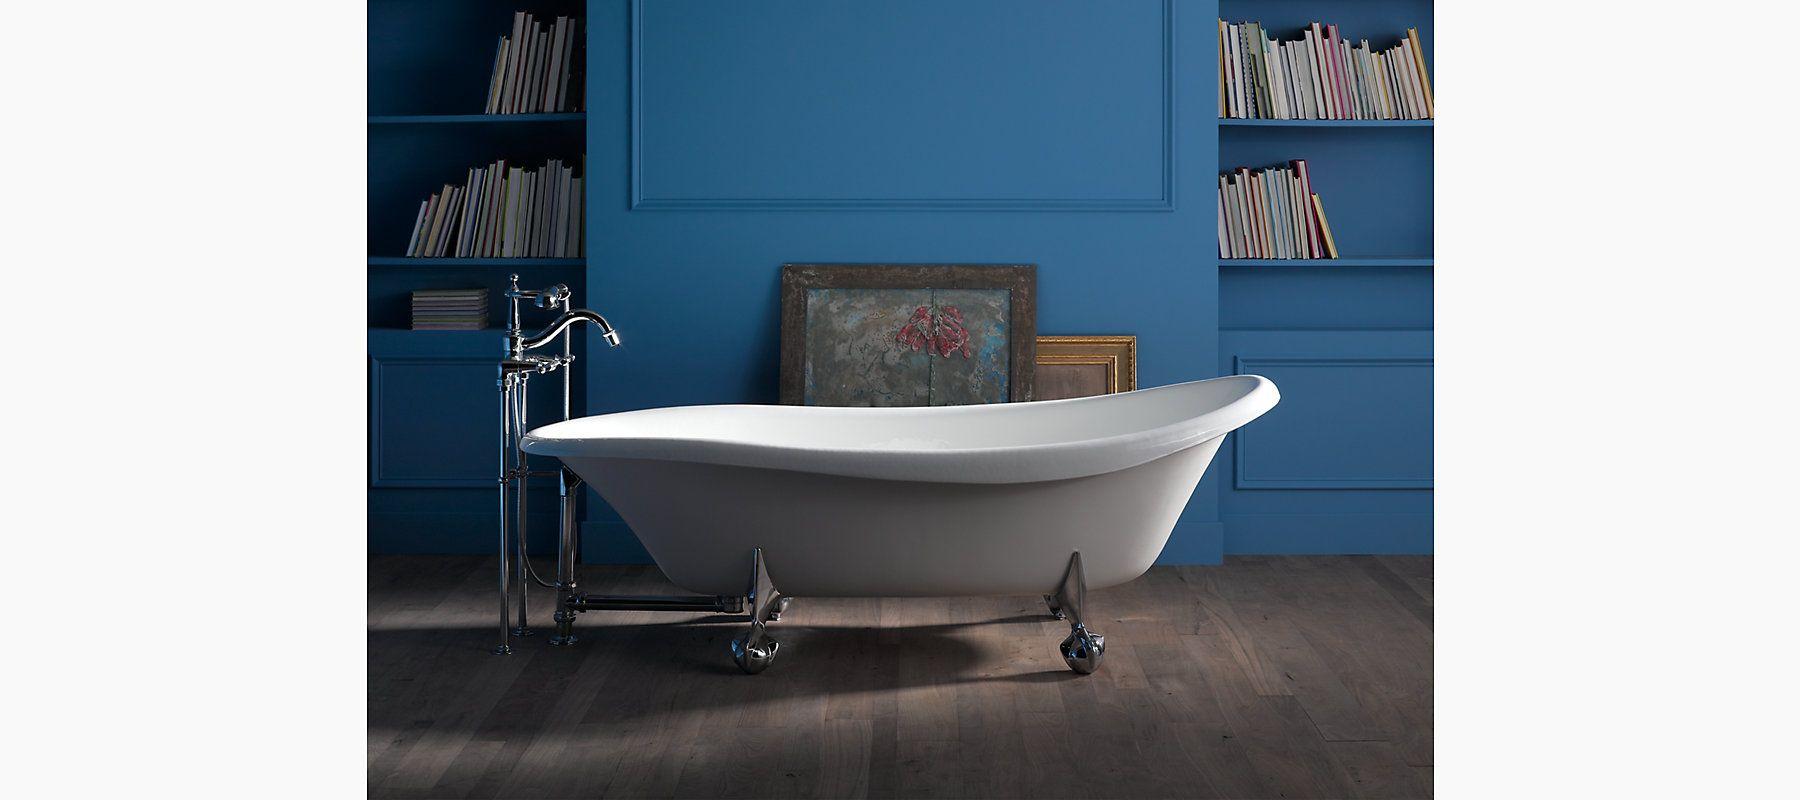 6 Foot Freestanding Birthday Bath K 100 Free Standing Bath Bath Kohler